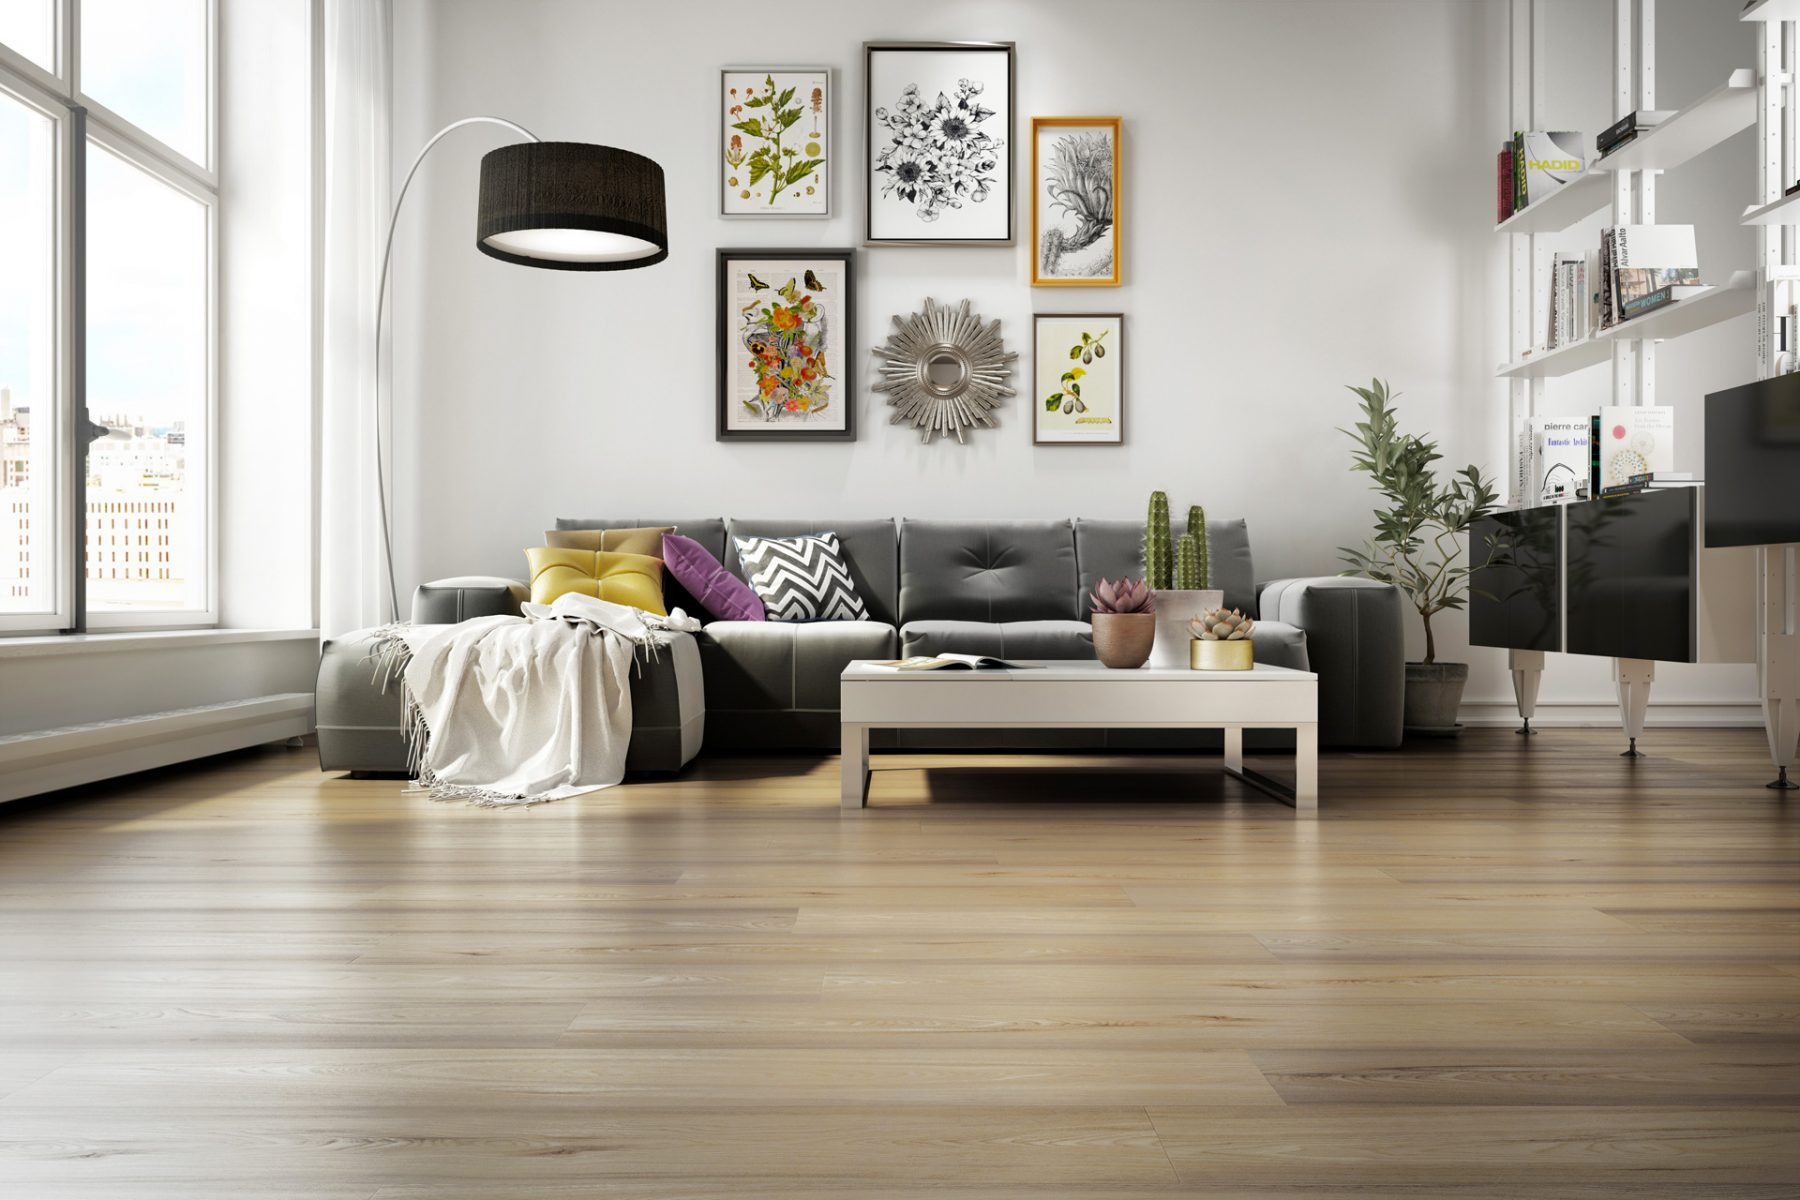 studio-design-3d-reality-like-livingroom